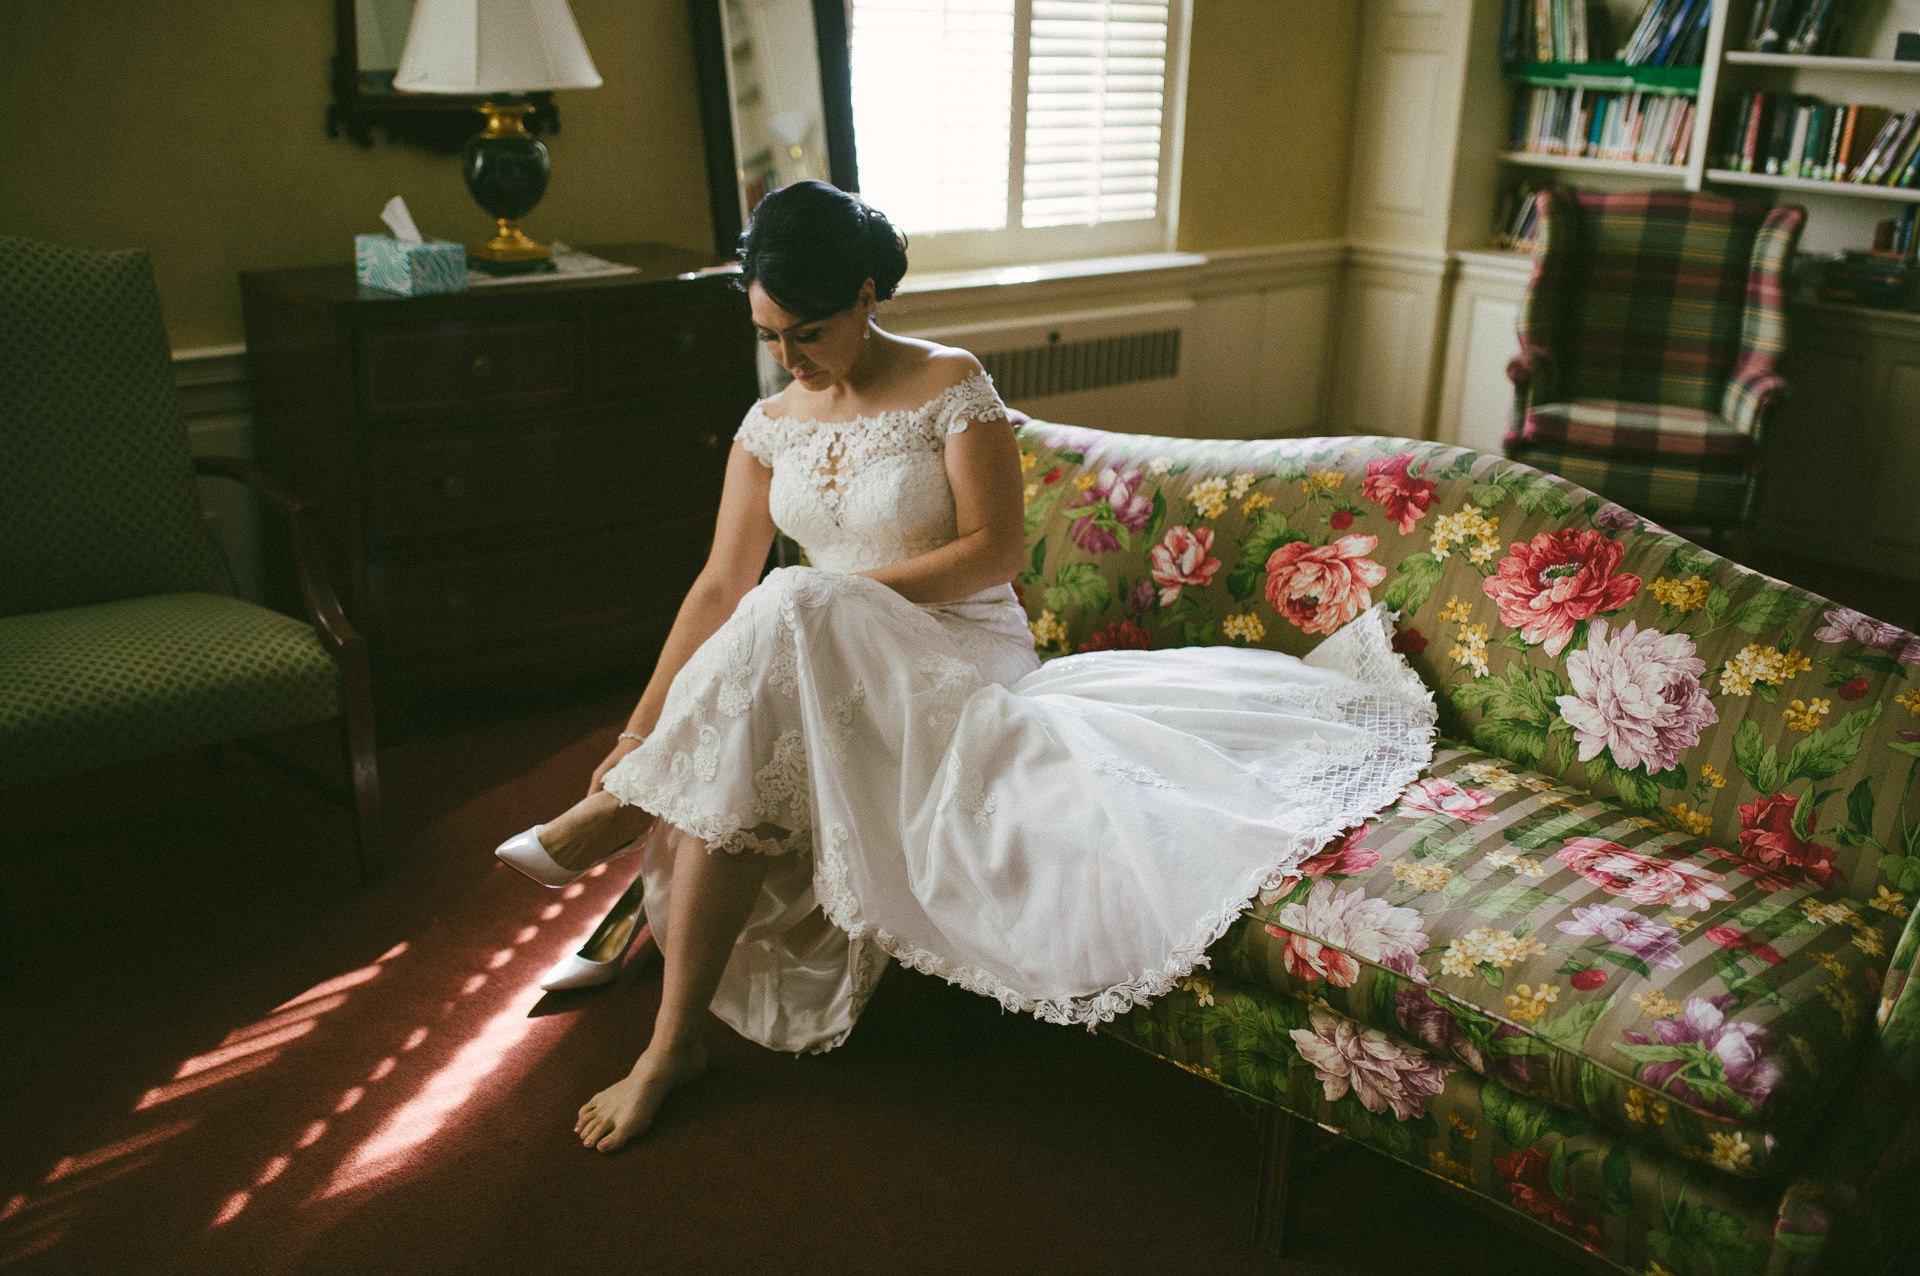 Patterson Fruit Farm Wedding Photographer in Cleveland 1 7.jpg